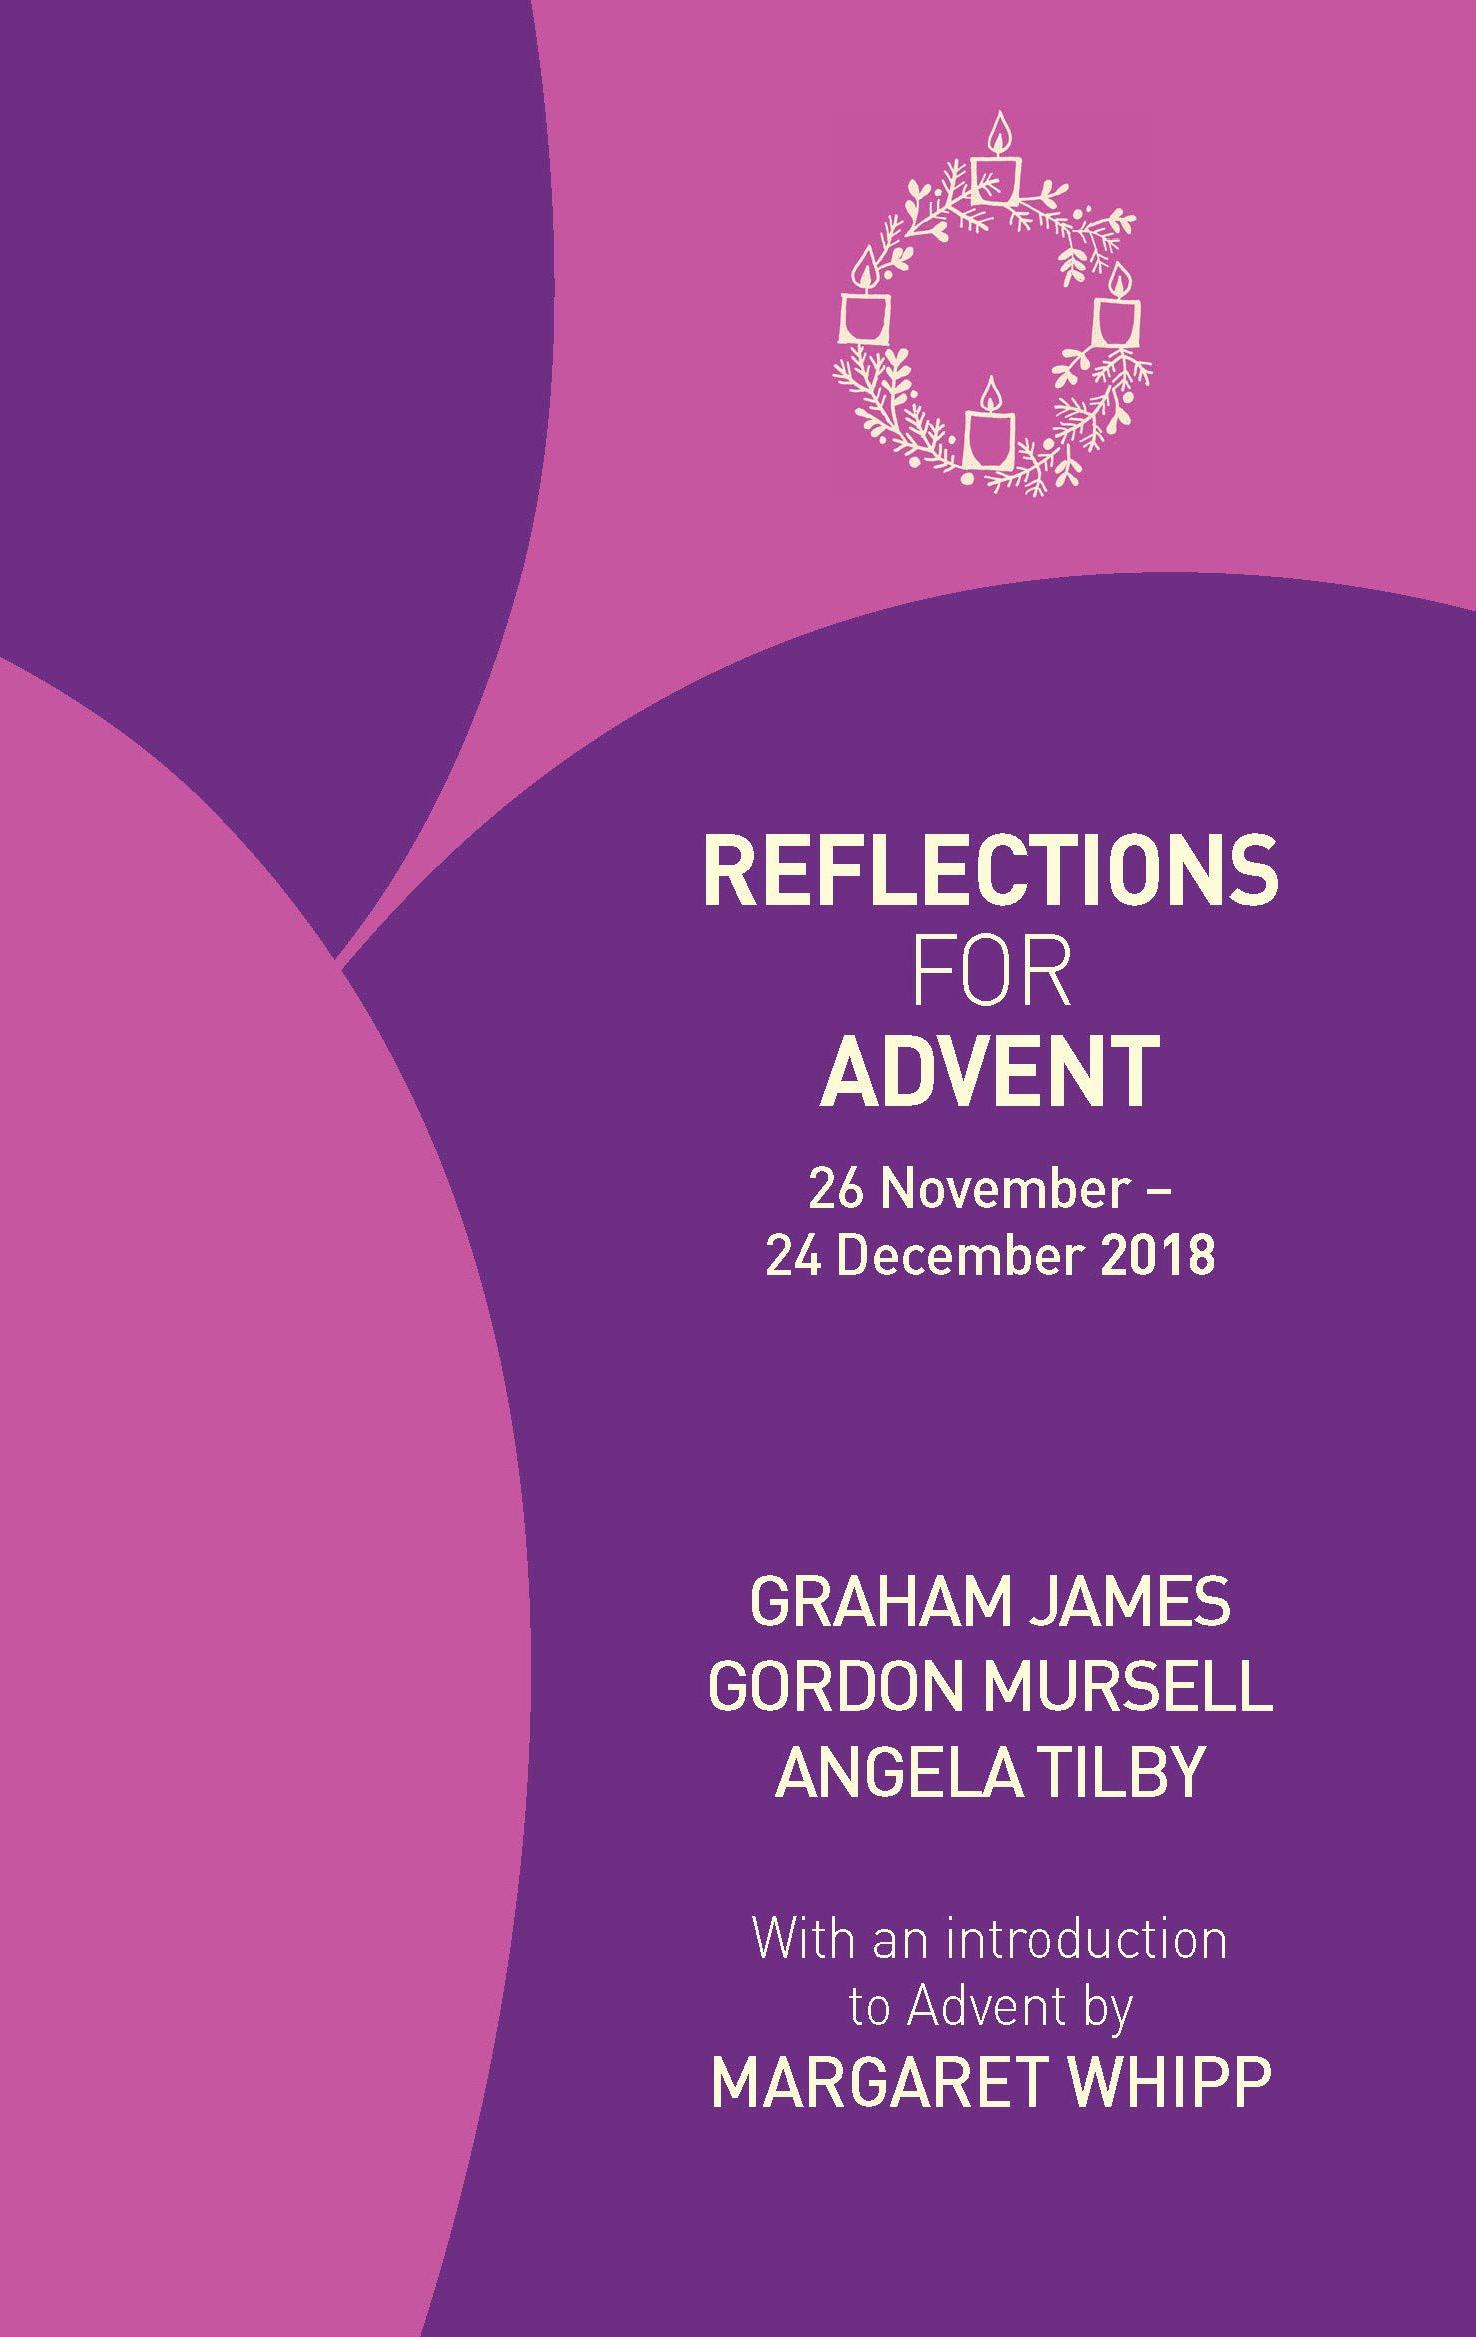 Reflections for Advent, 26 November – 24 December 2018